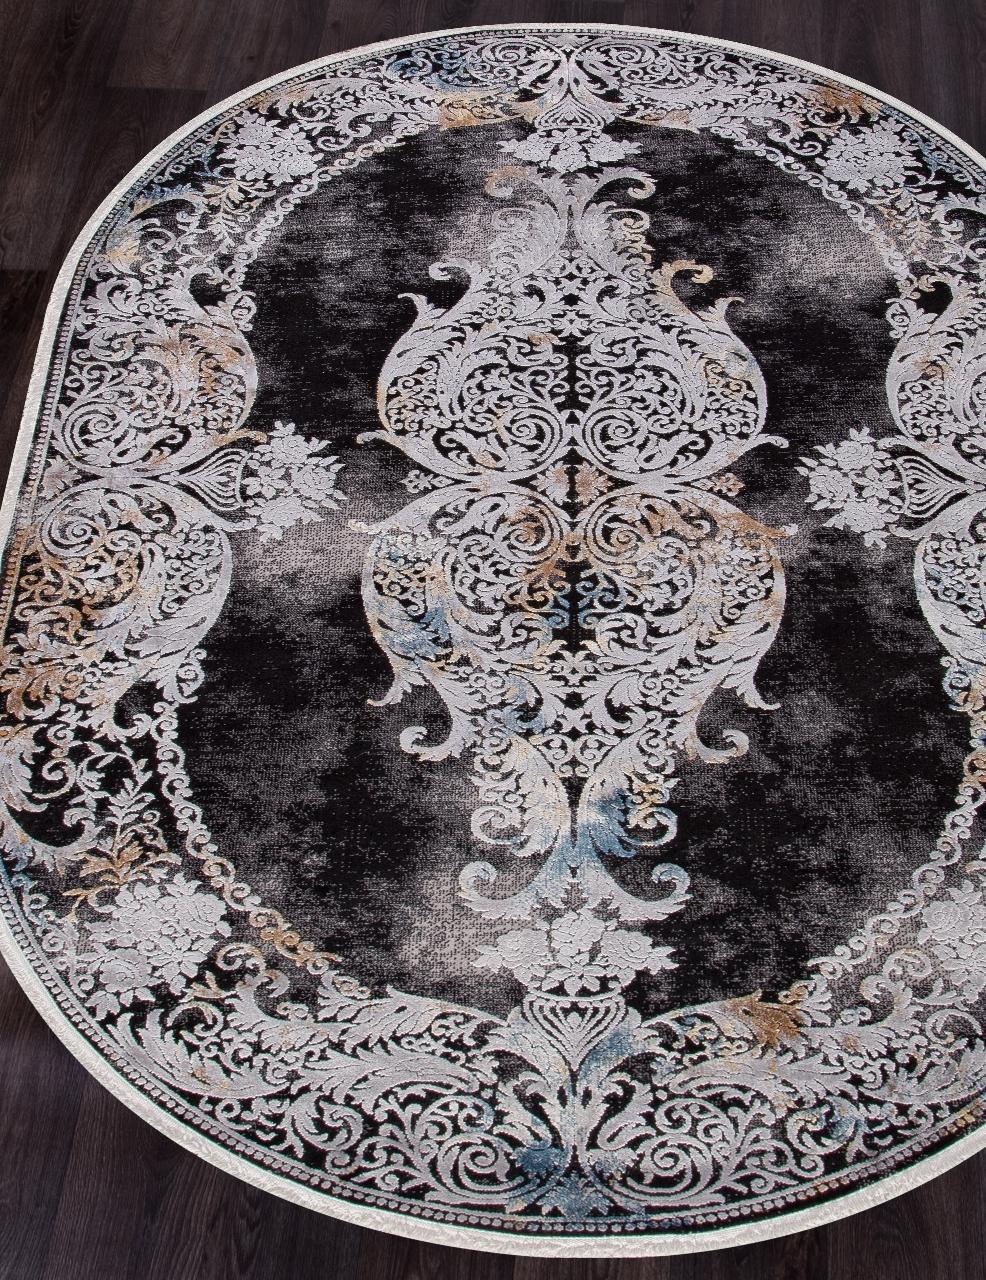 Ковер 18131 - GRAY / BLACK - Овал - коллекция ERVA